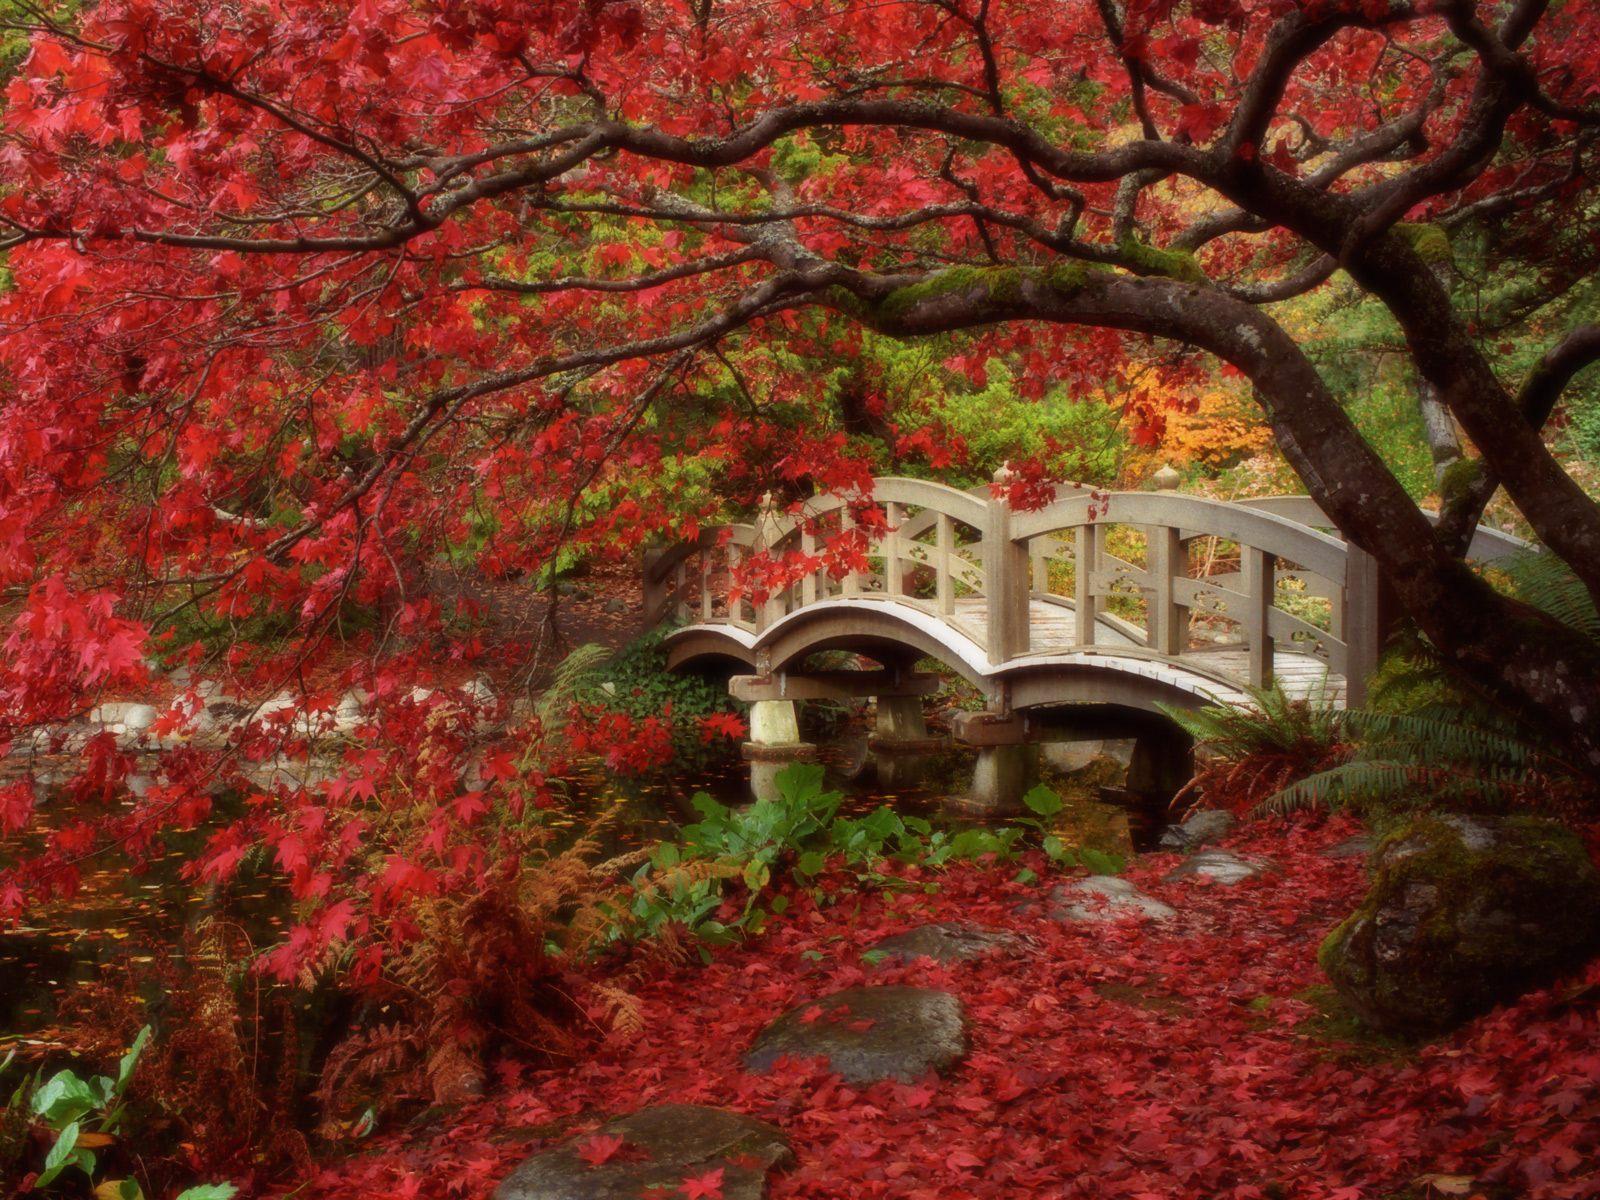 http://2.bp.blogspot.com/-tF5U6sAEY7A/TxRlFsuaixI/AAAAAAAAAUs/VSVfEa2BUls/s1600/Japanese+wallpaper_japanese-garden-british-columbia-HD_wallpapers.jpg